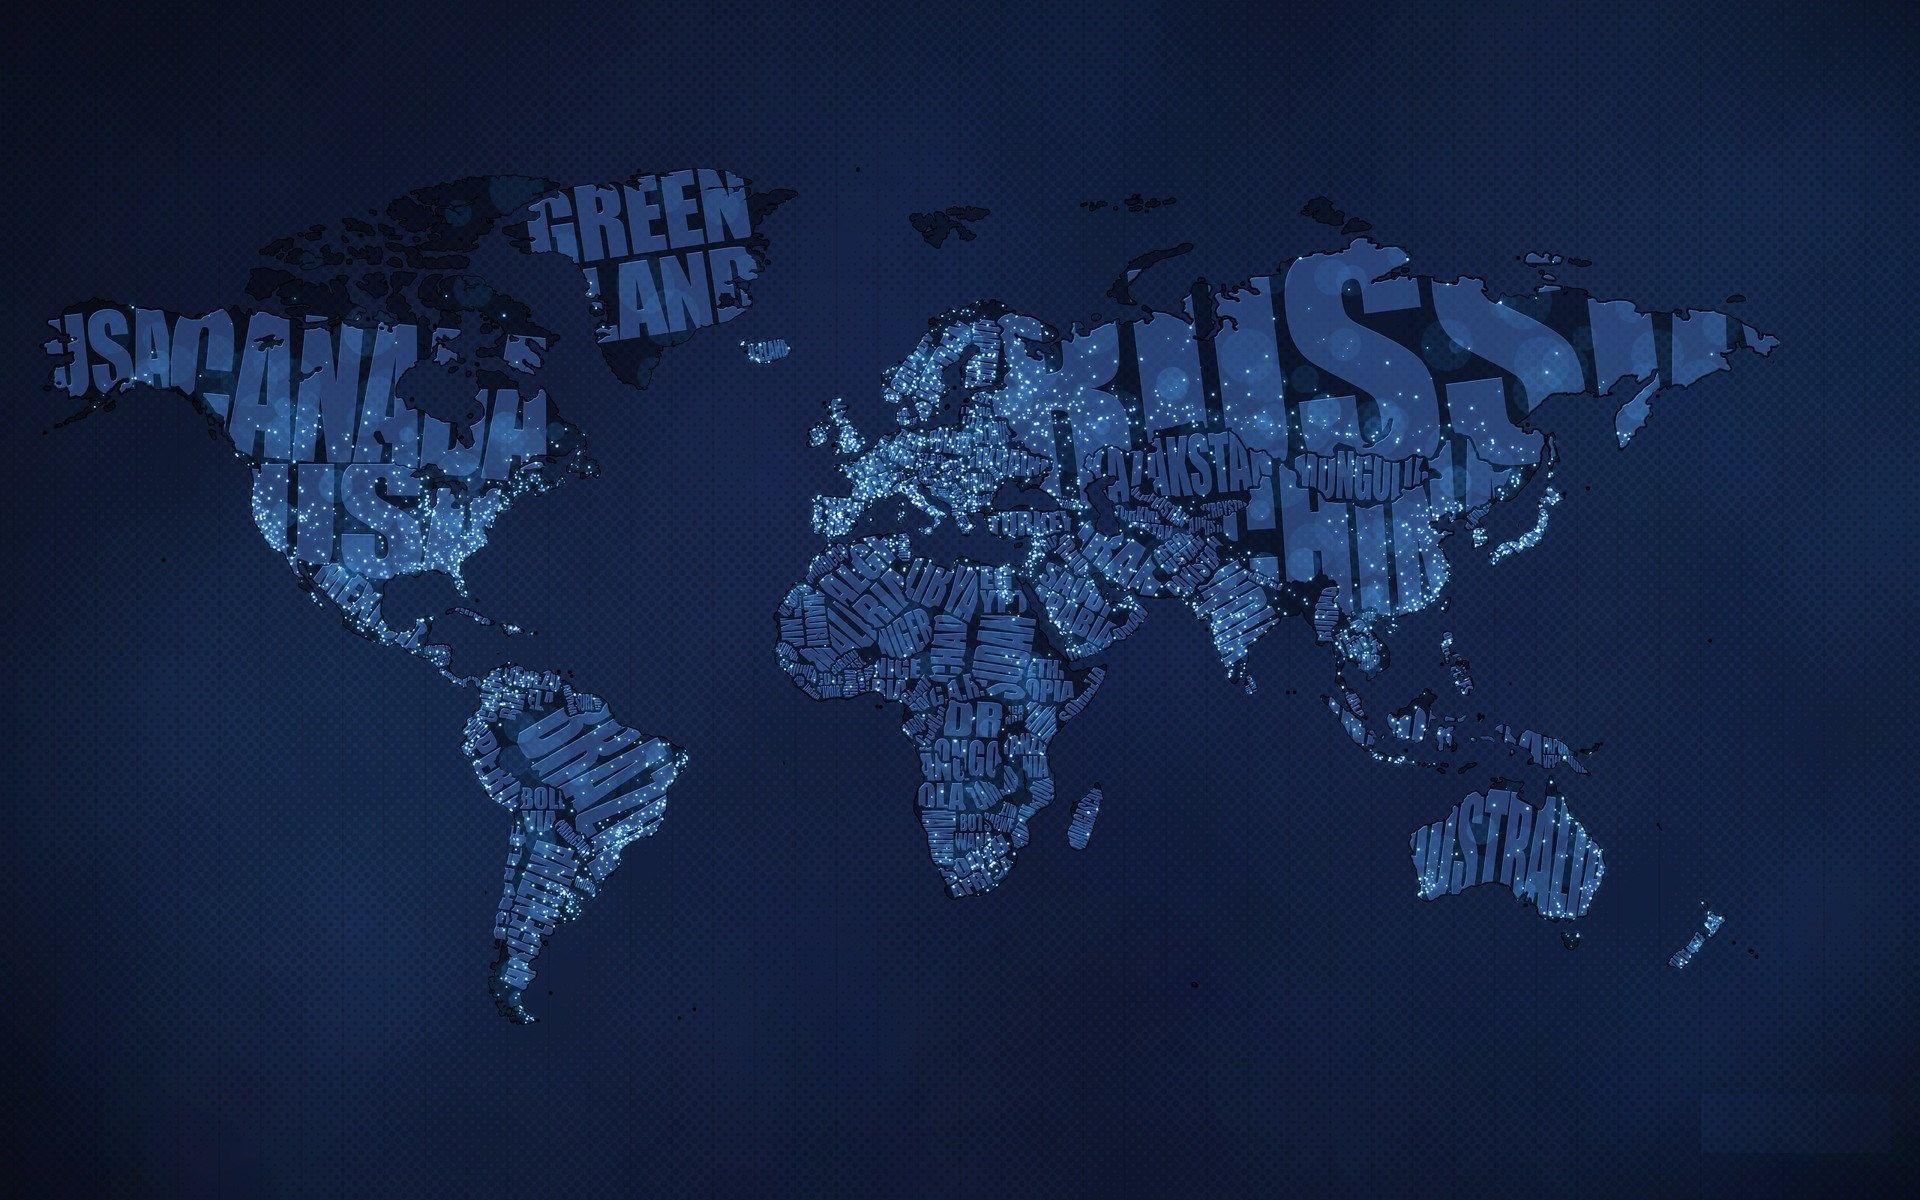 typographic world map night wallpapers hd ololoshenka Pinterest